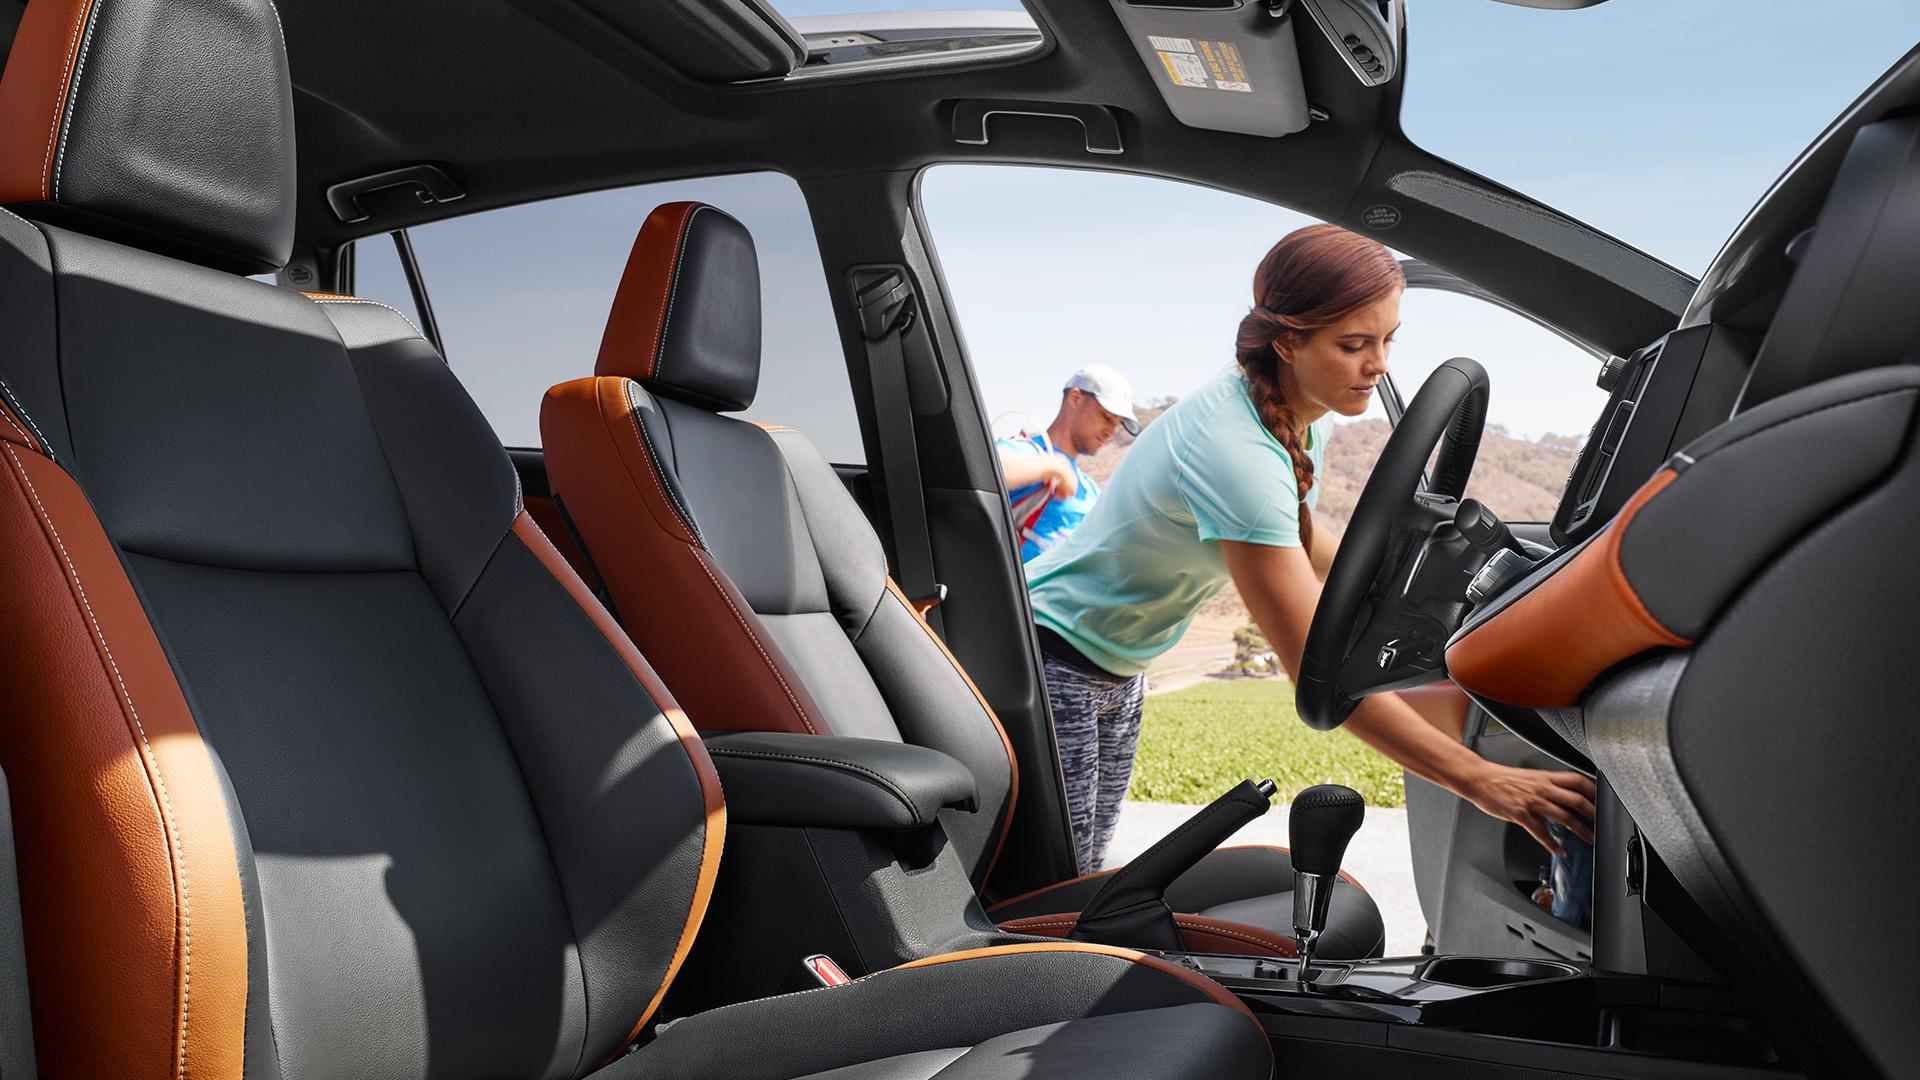 2017 Toyota Rav4 Interior Lightbox